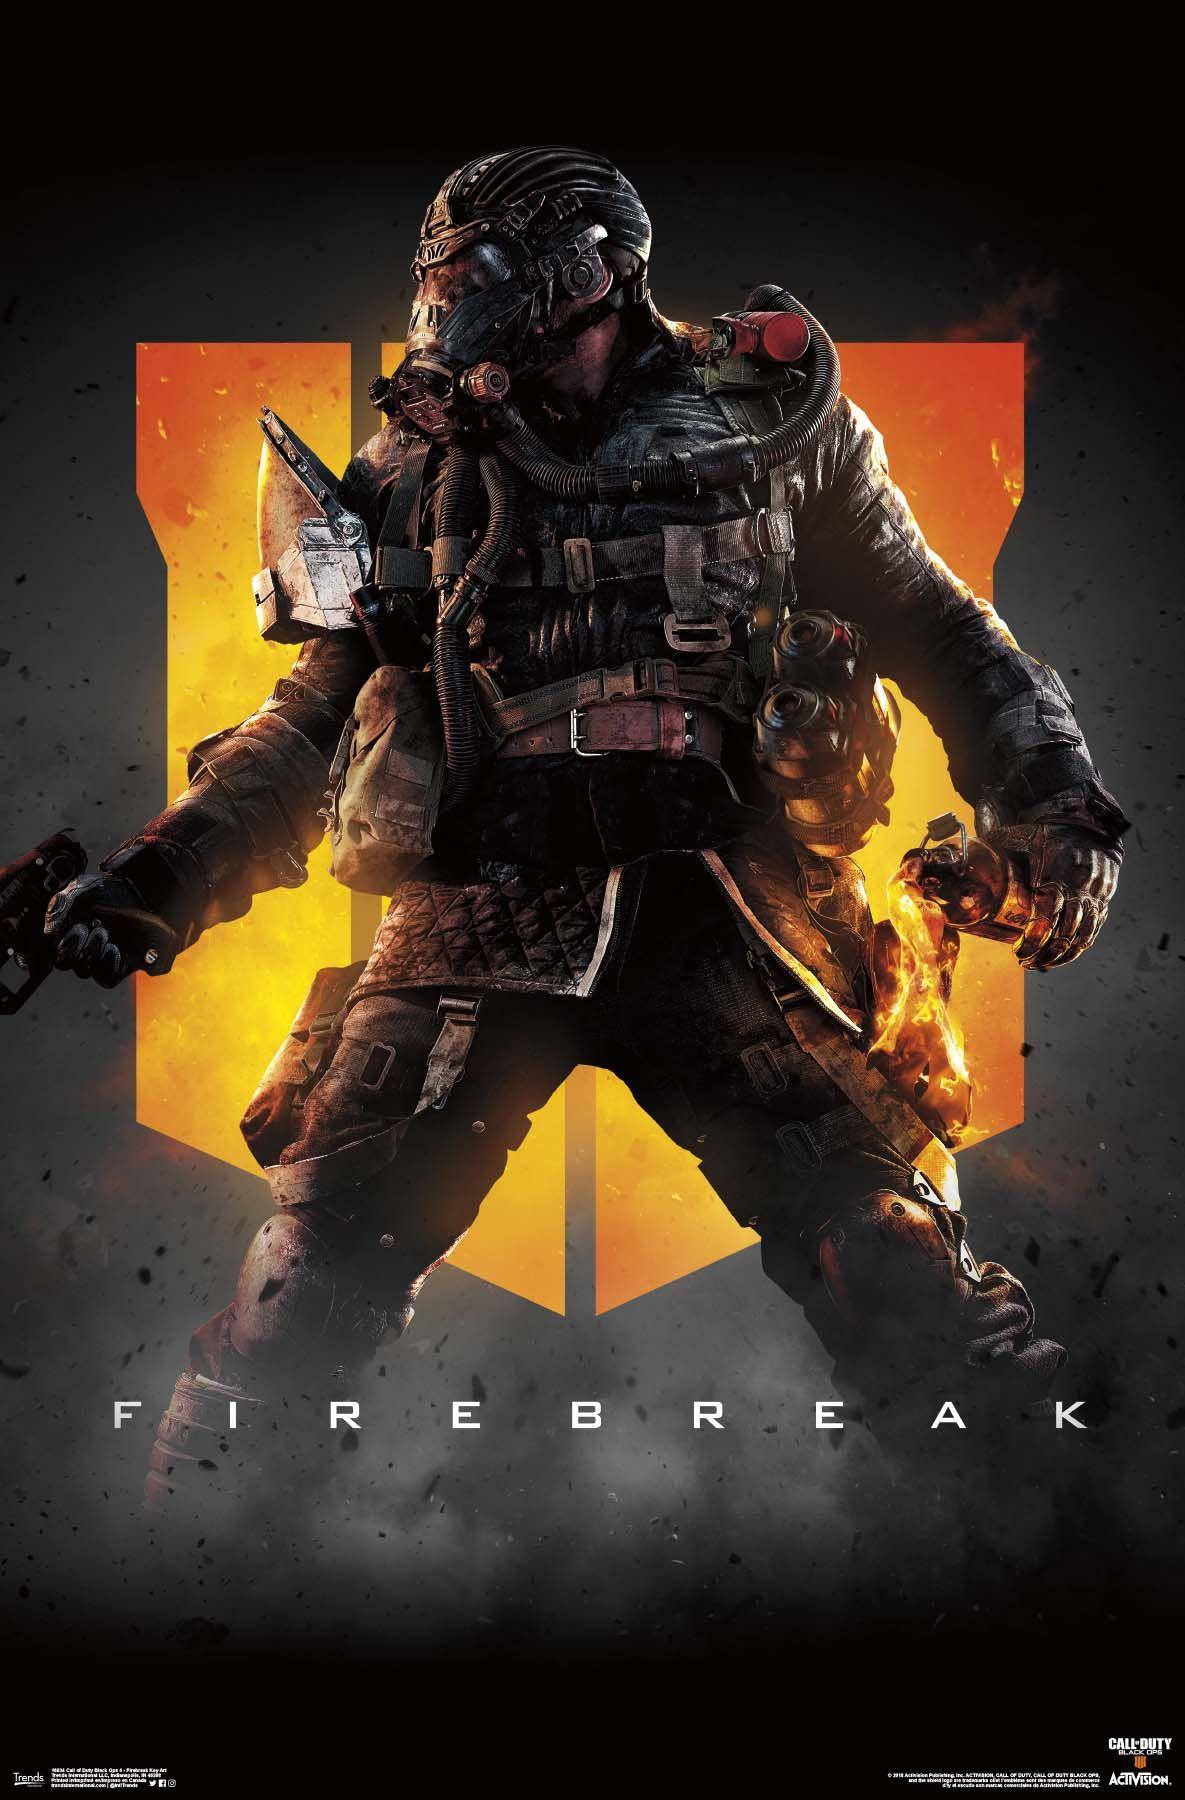 Call Of Duty Black Ops 4 Firebreak Key Art Poster And Poster Clip Bundle Walmart Com Call Of Duty Poster Prints Call Of Duty Black